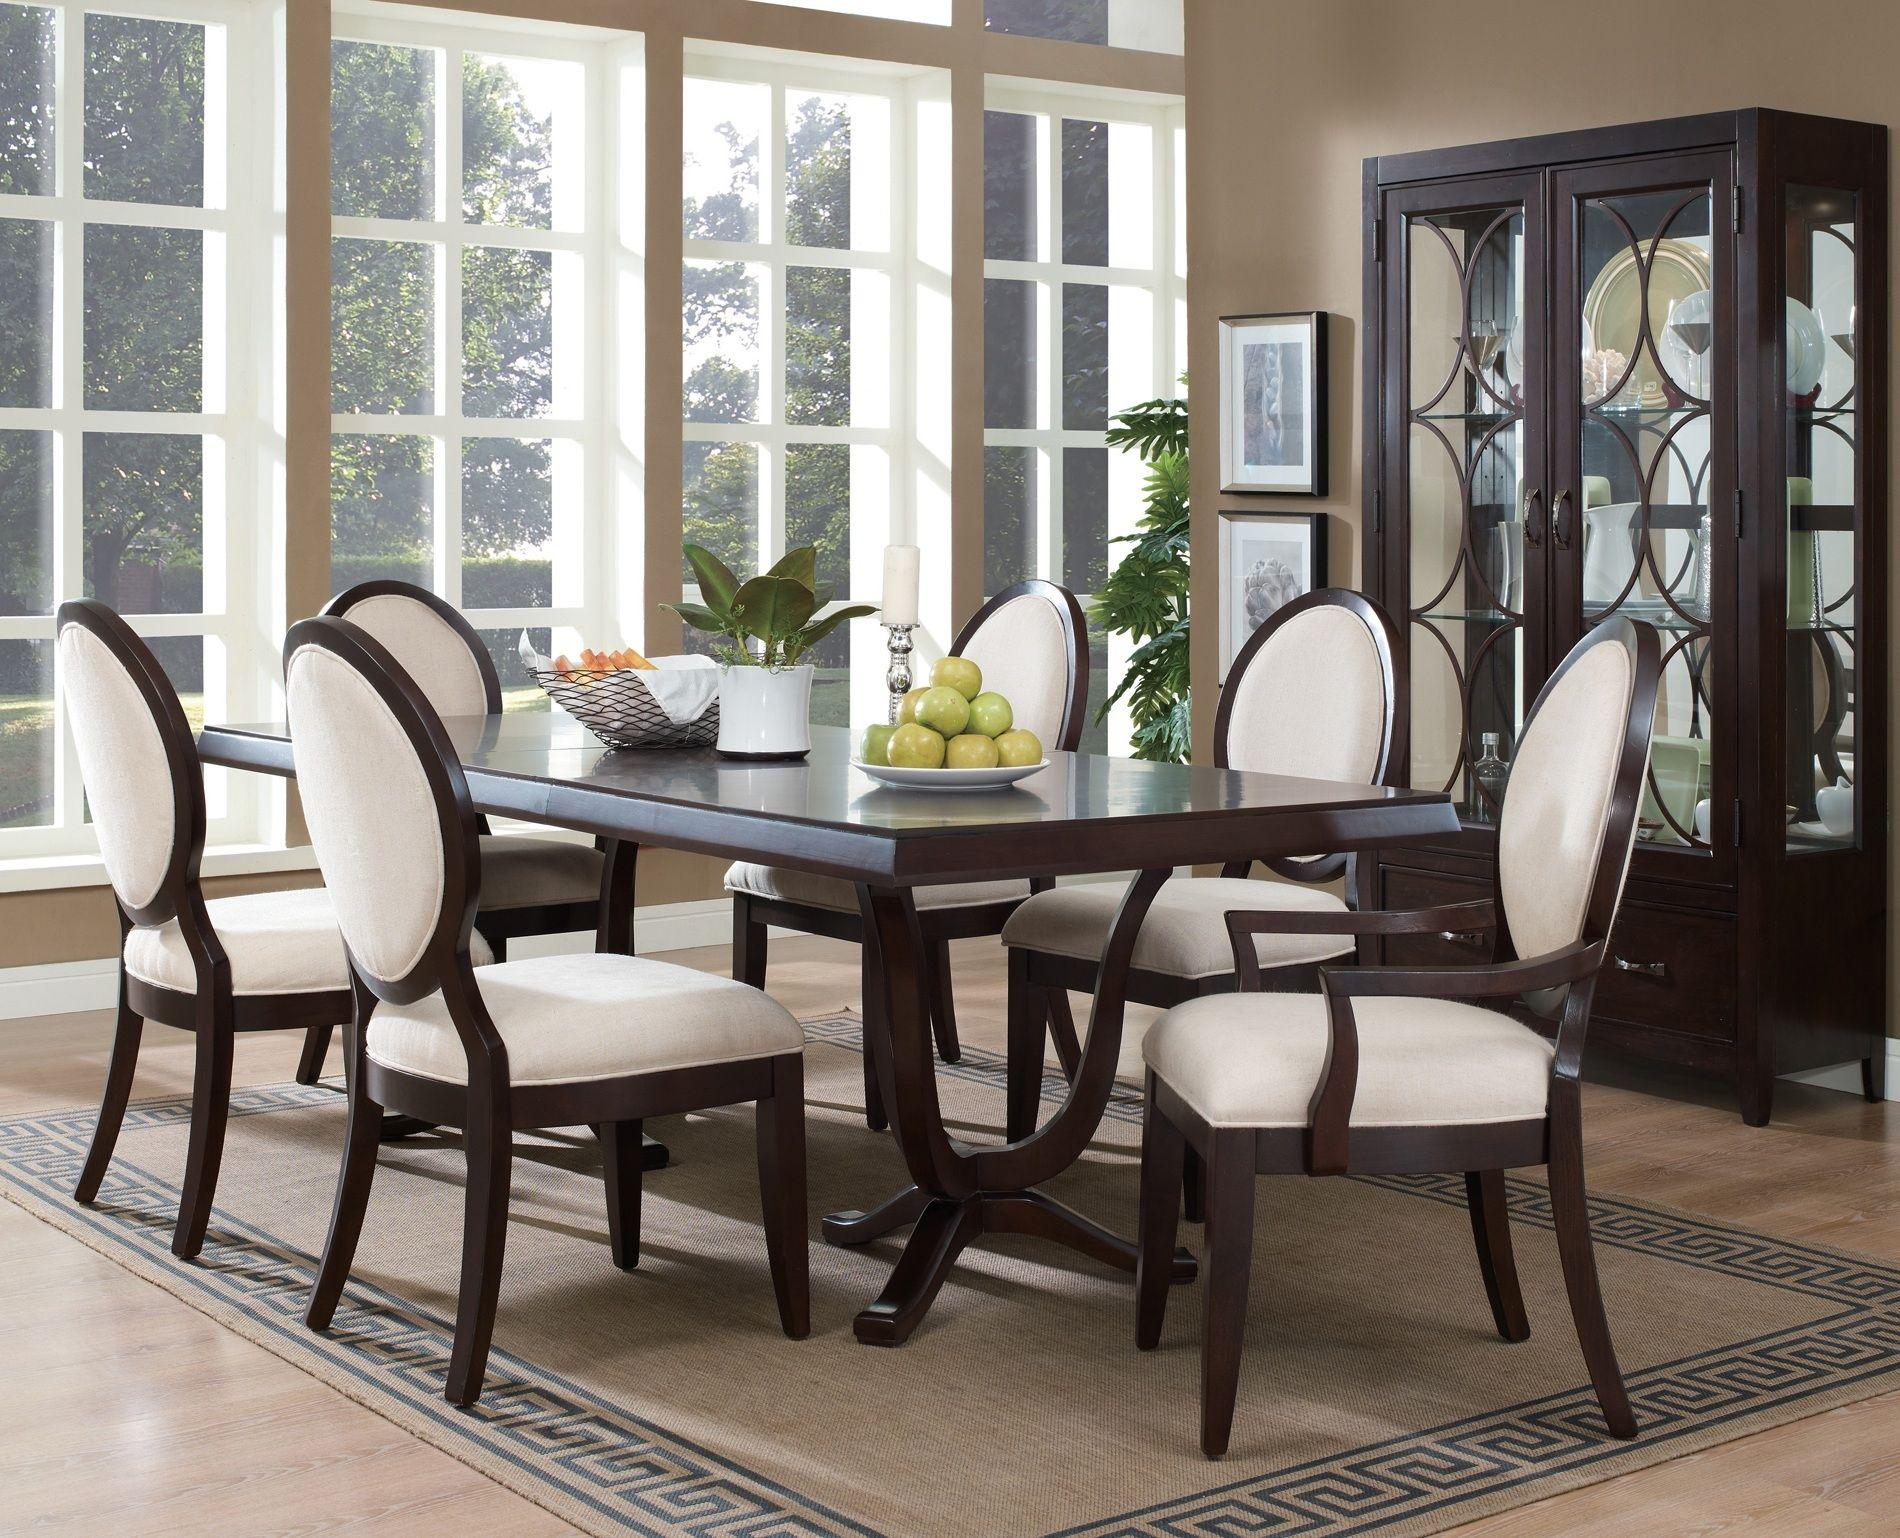 dark wood dining room table sets http lachpage com pinterest rh pinterest co uk